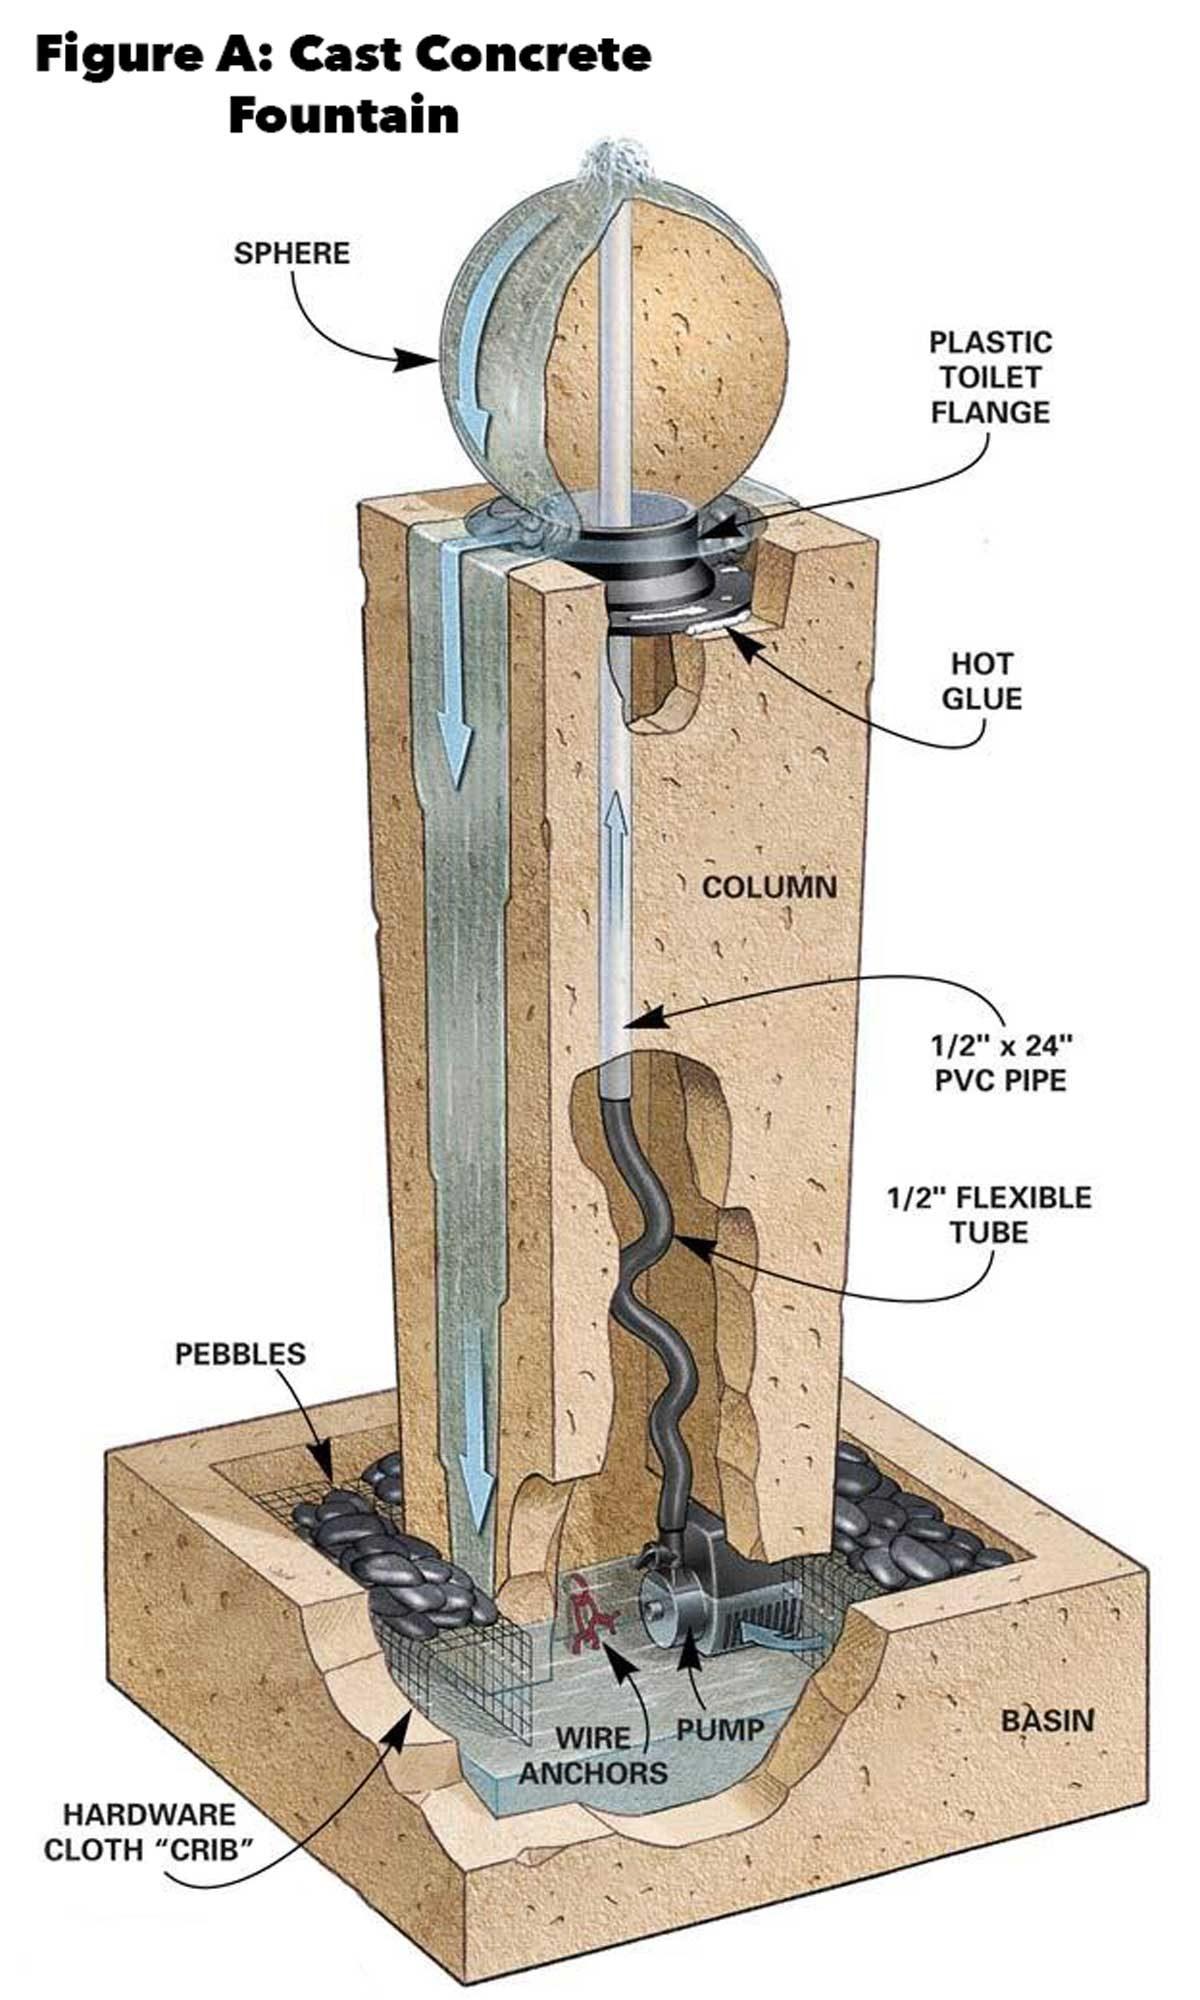 Figure a cast concrete fountain